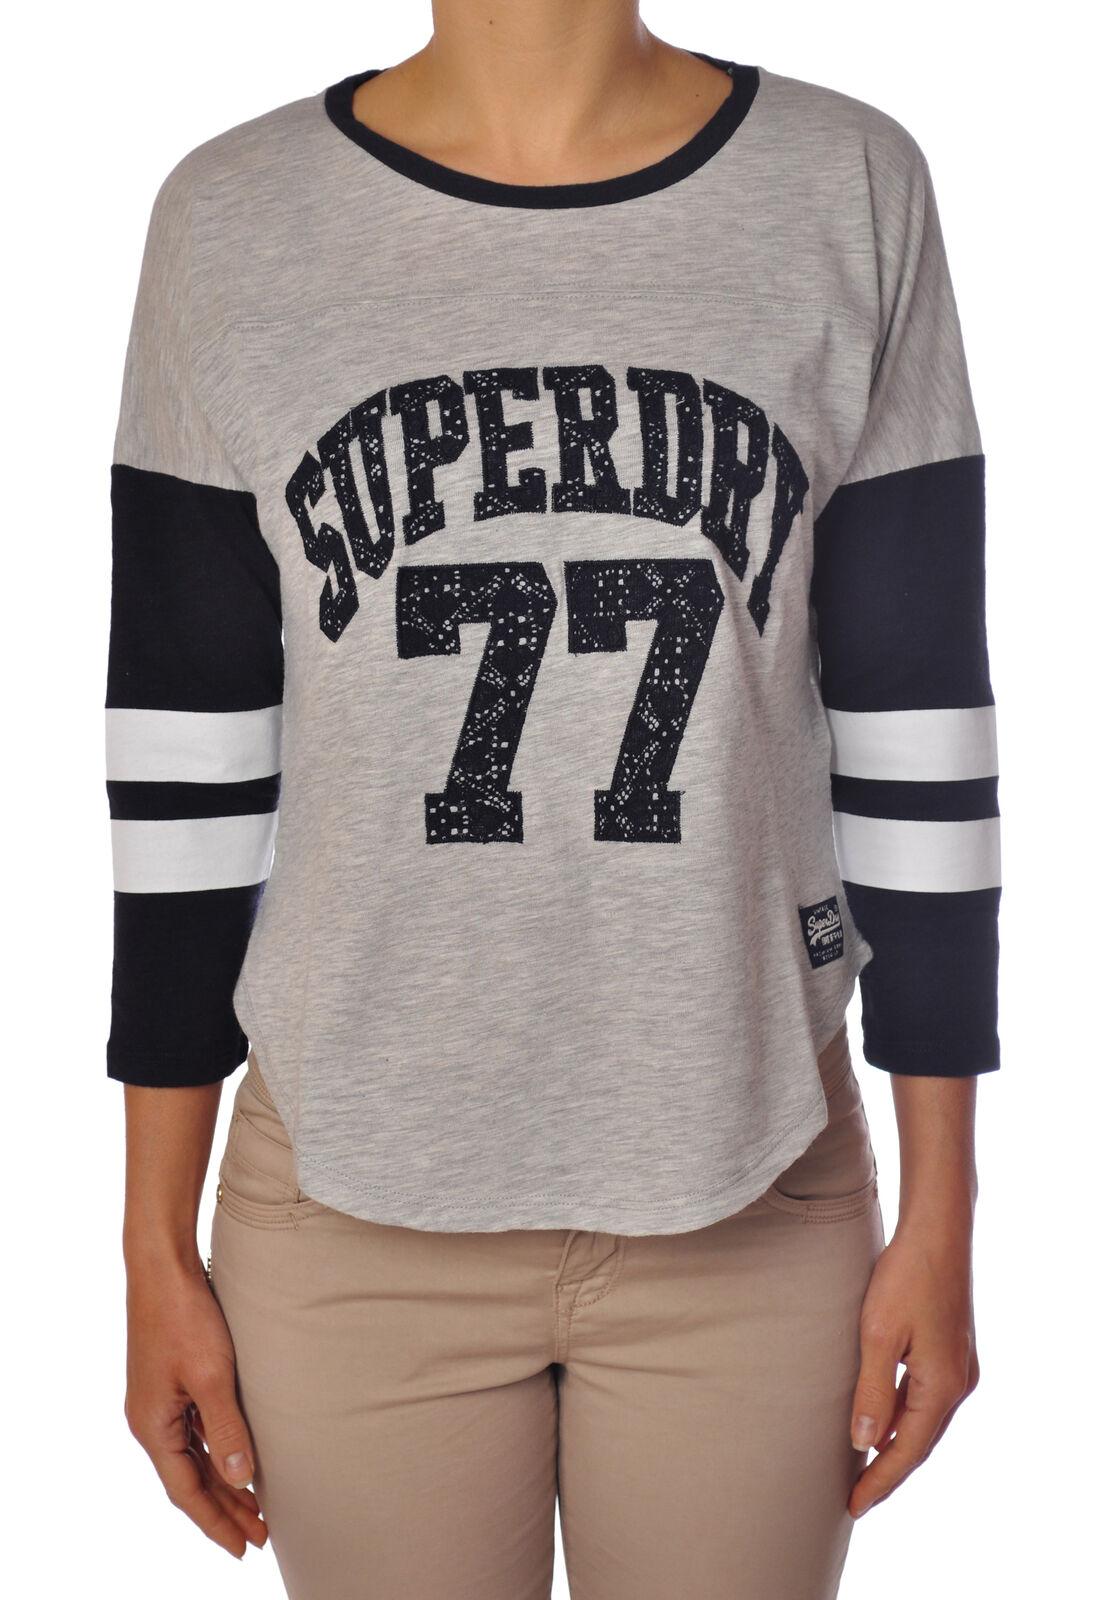 Superdry  -  T - Female - grau - 1985613A185948